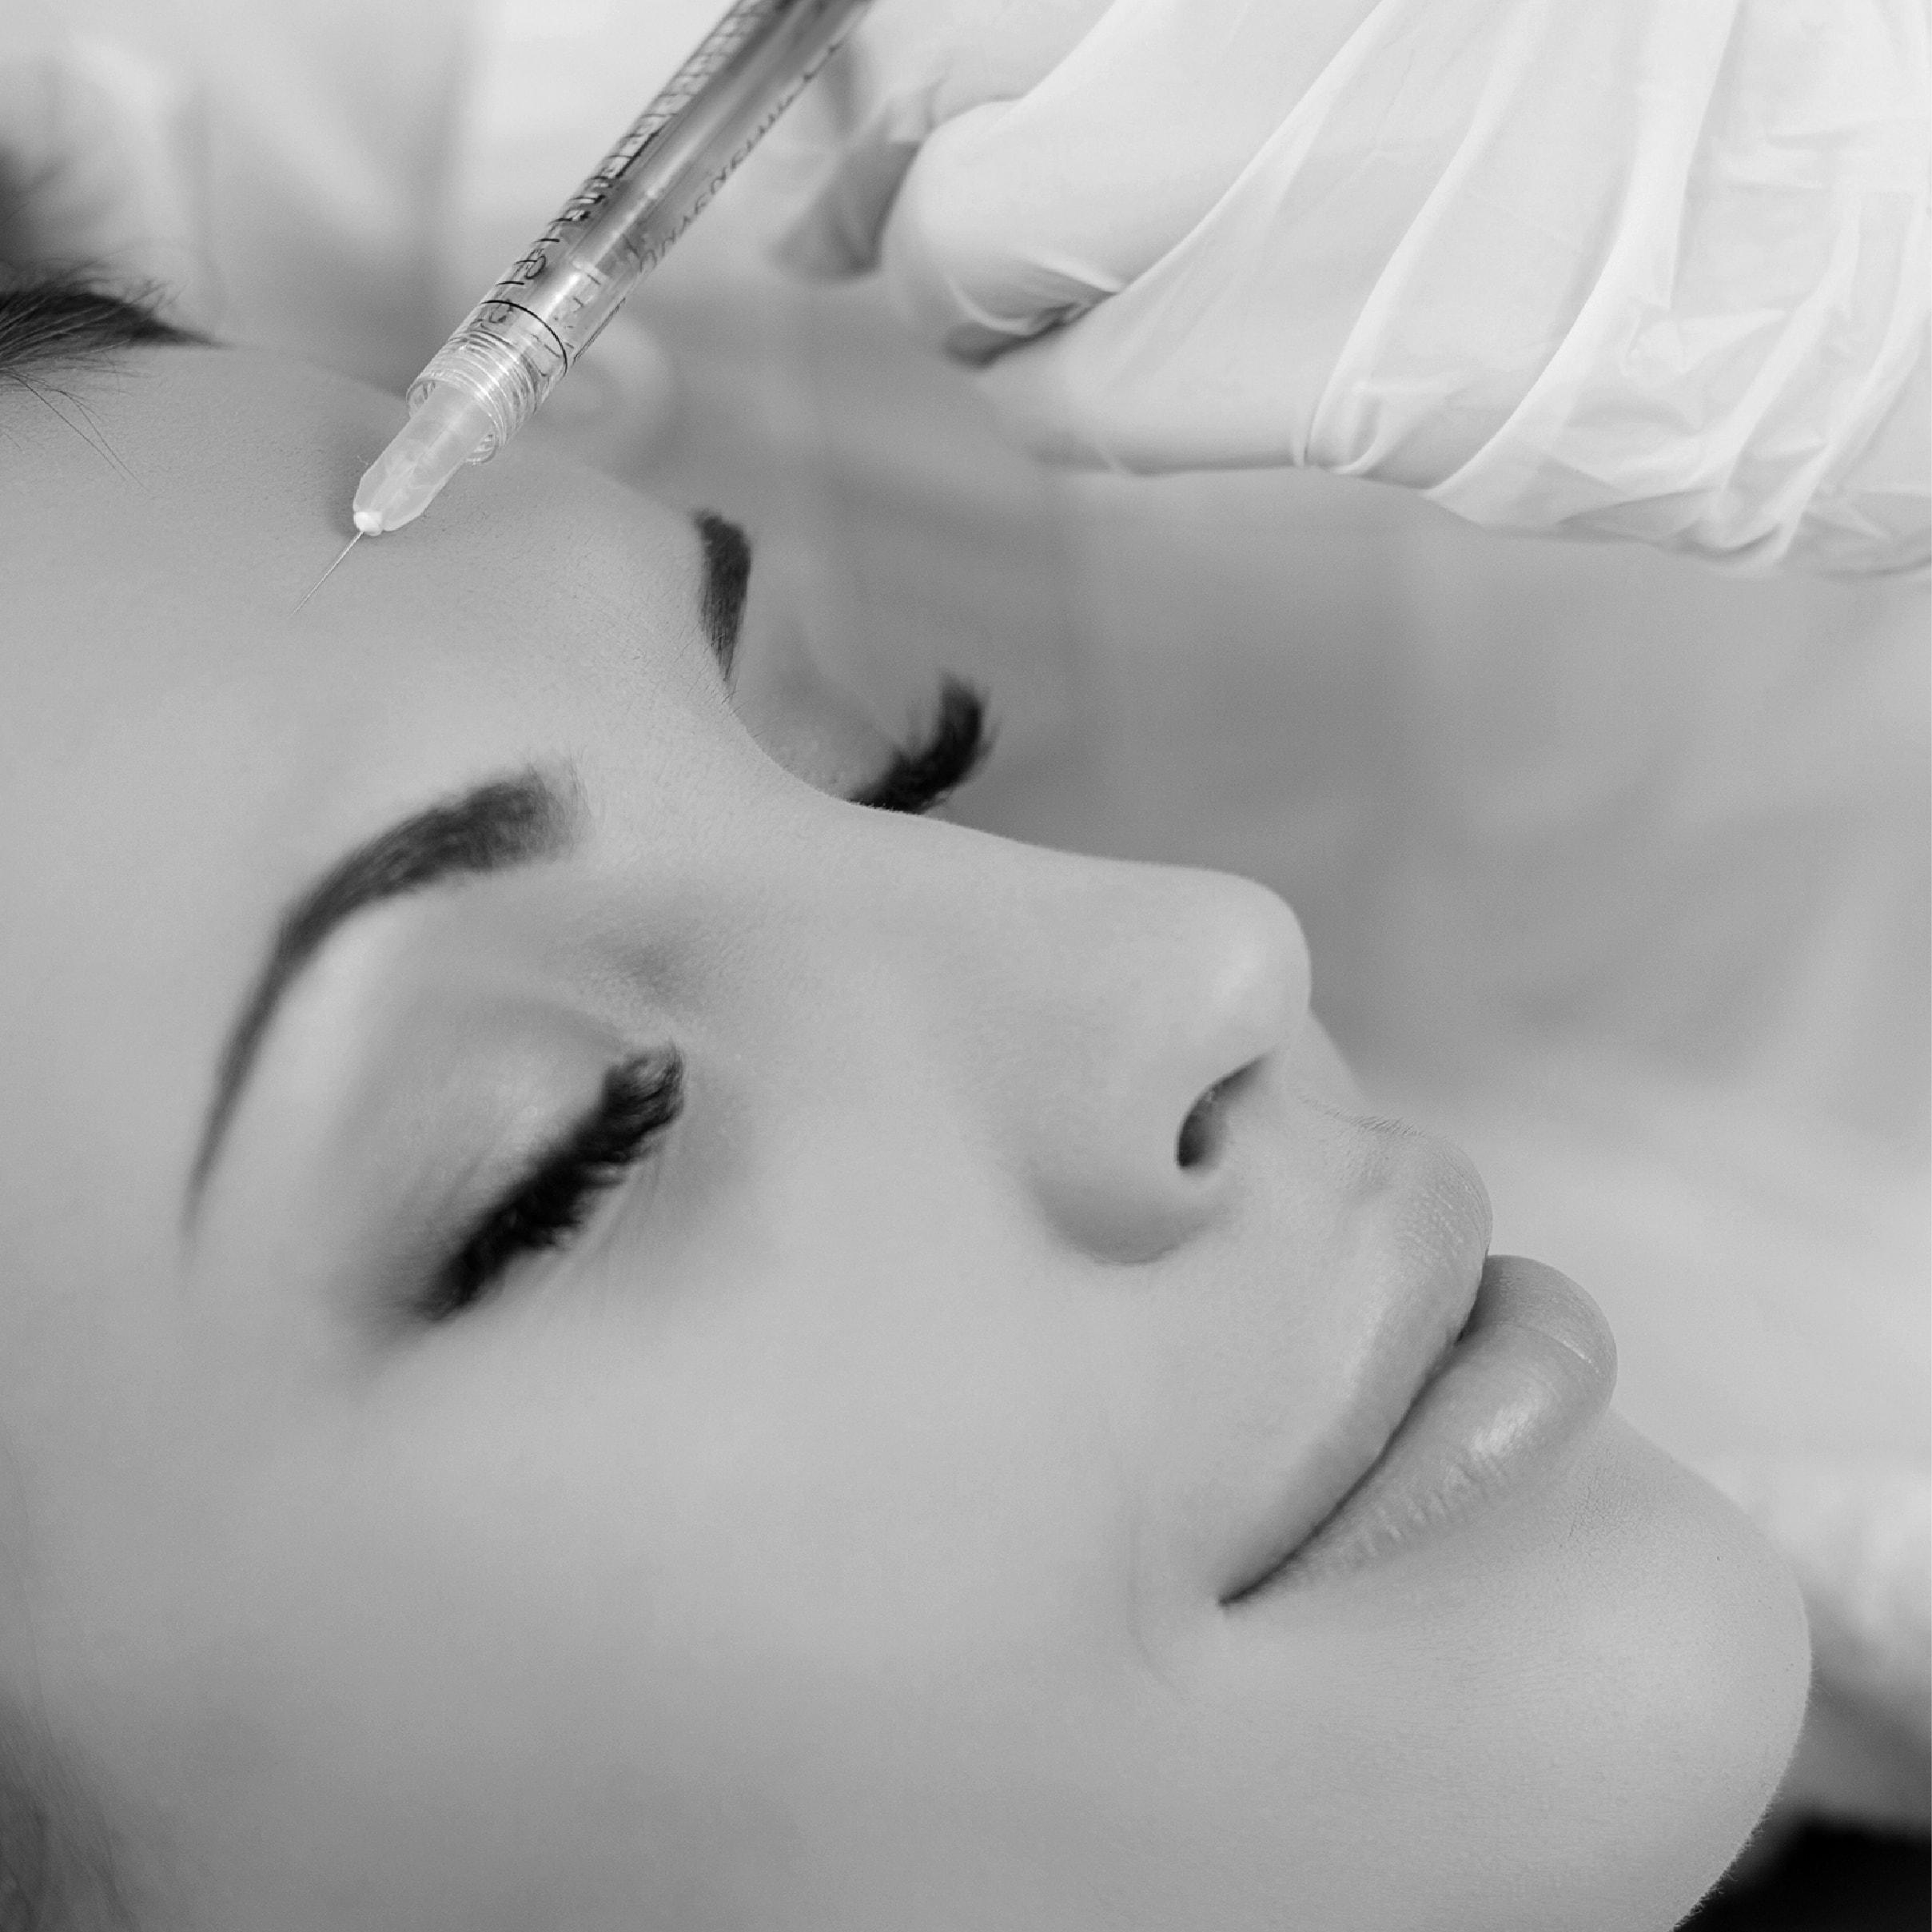 Medicina estetica del viso, la tossina botulinica